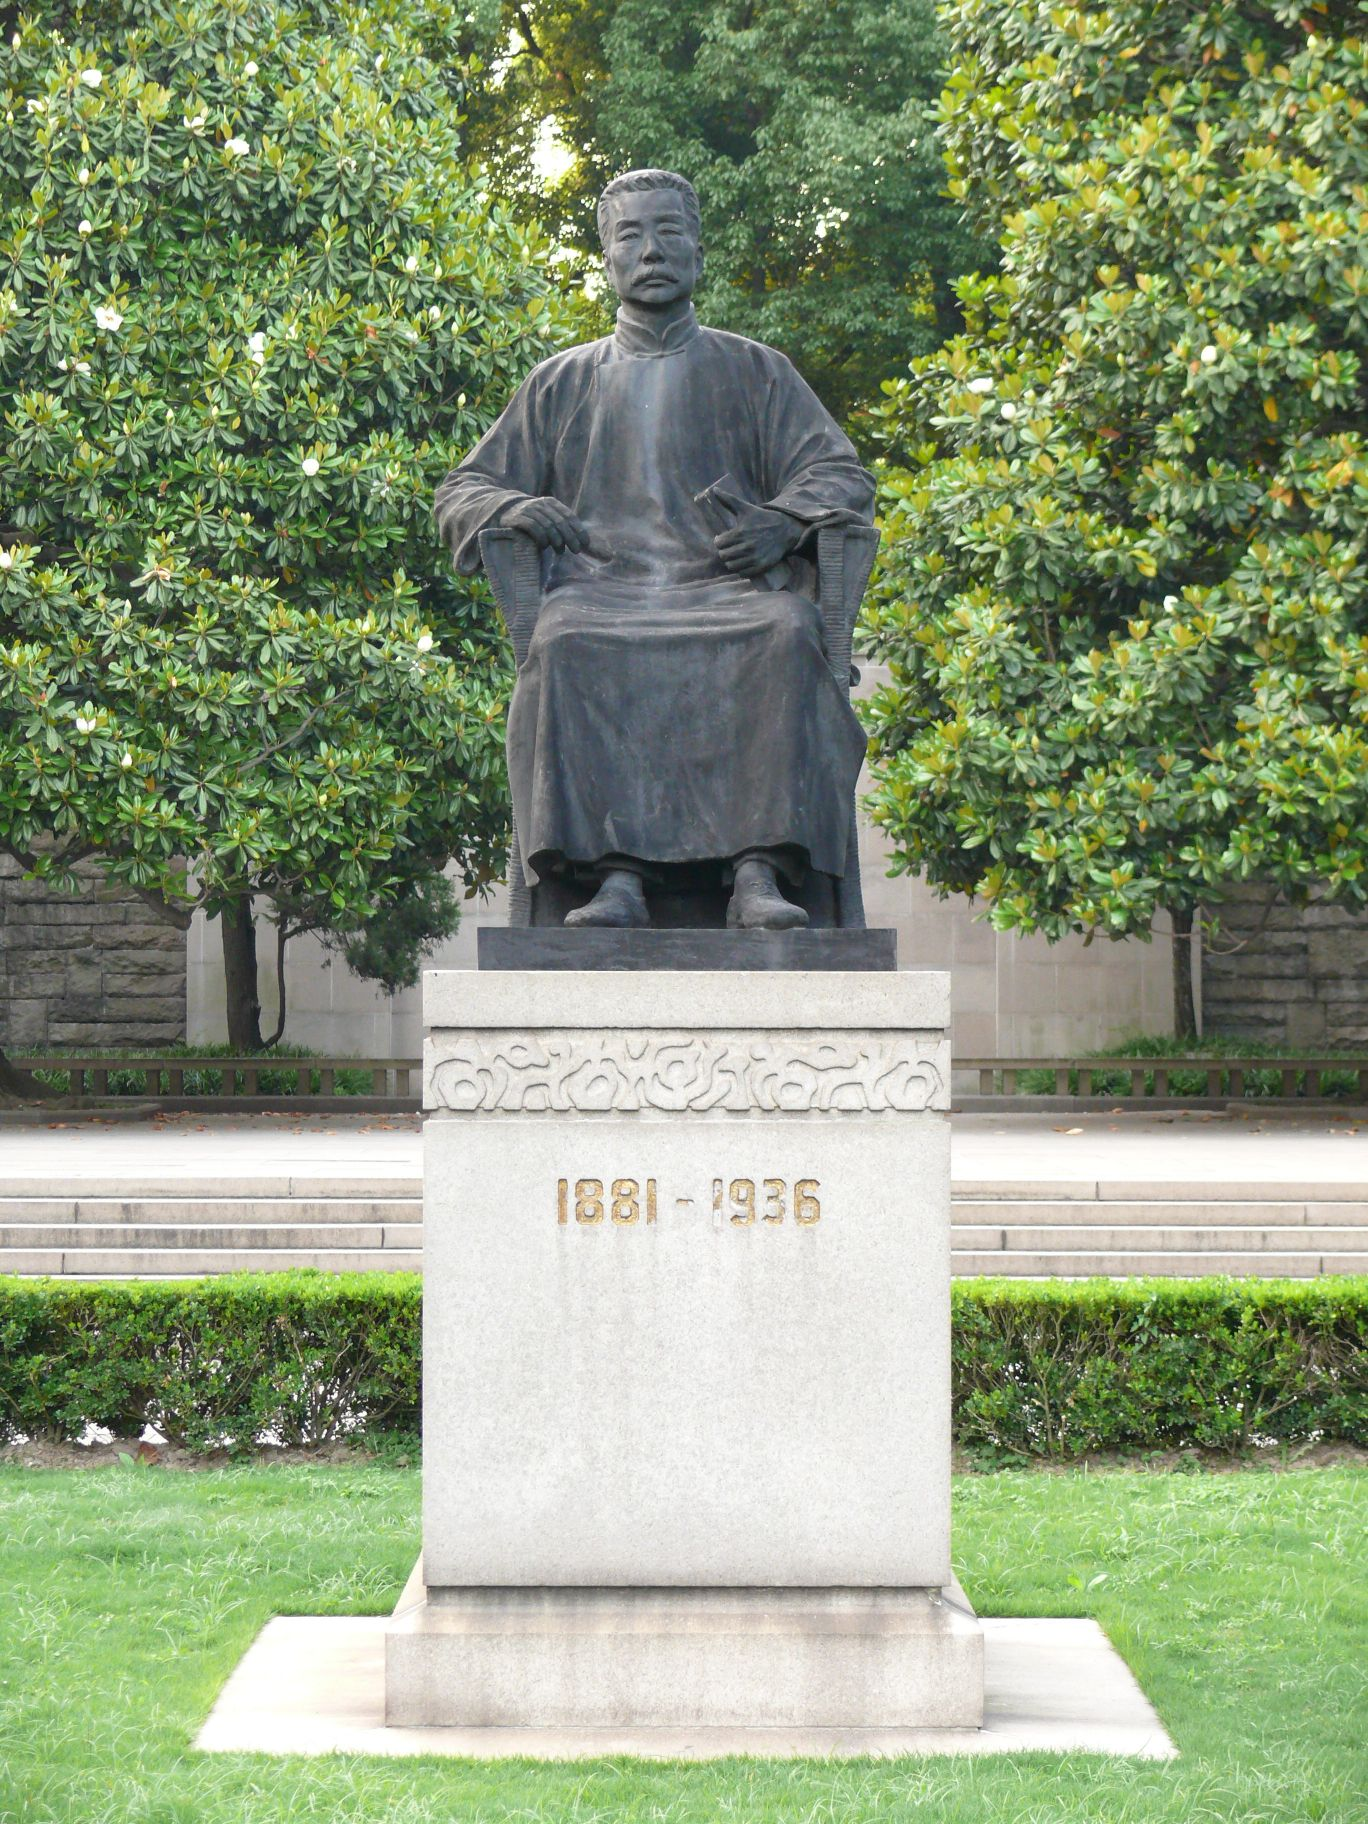 Lu Xun's grave in Shanghai (via Wikimedia Commons)